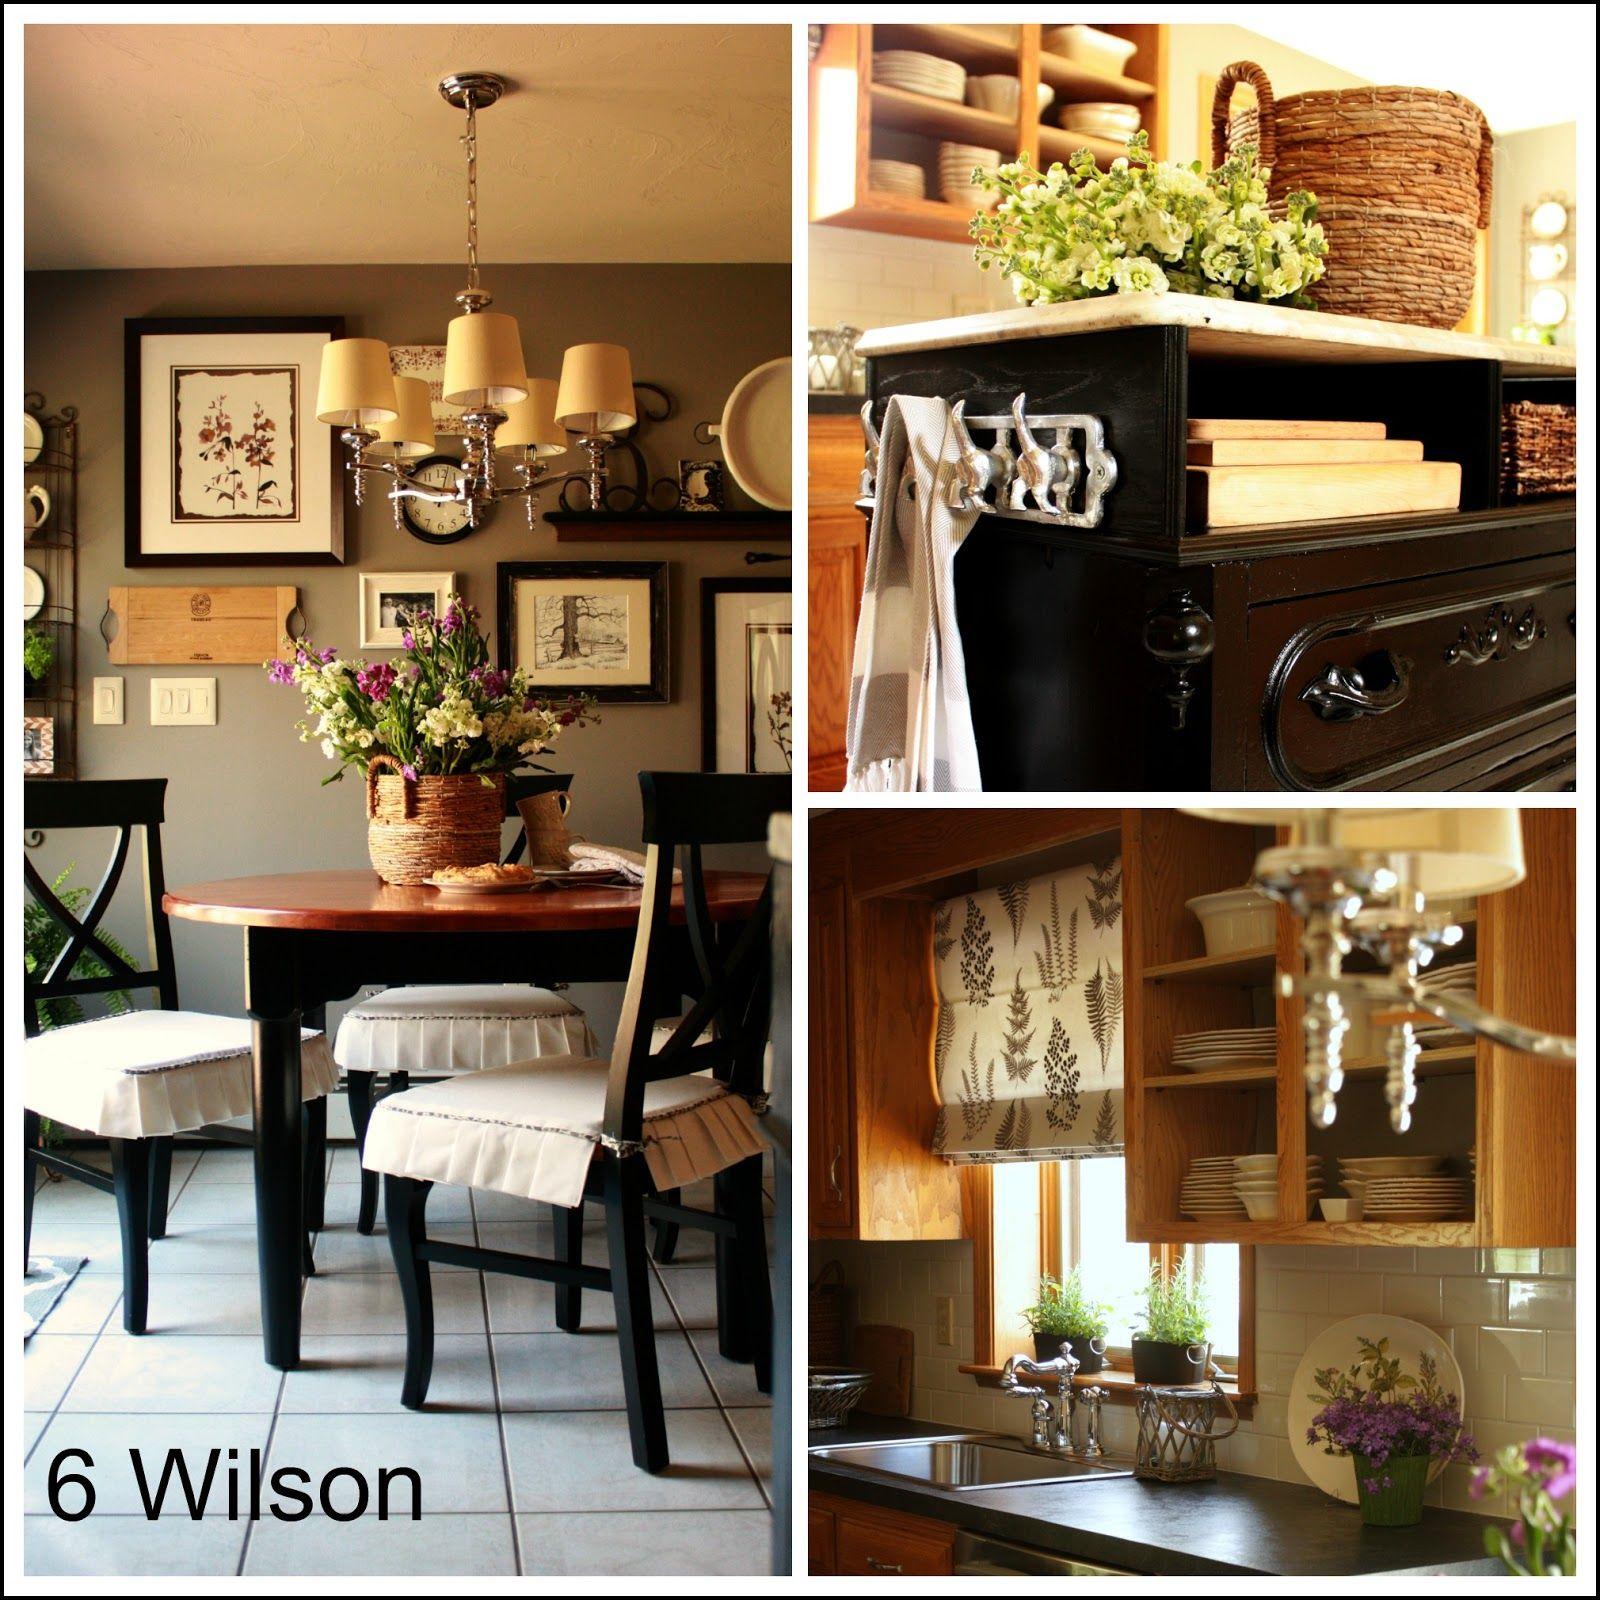 6 Wilson Love The Cream Backsplash Subway Tiles And Black